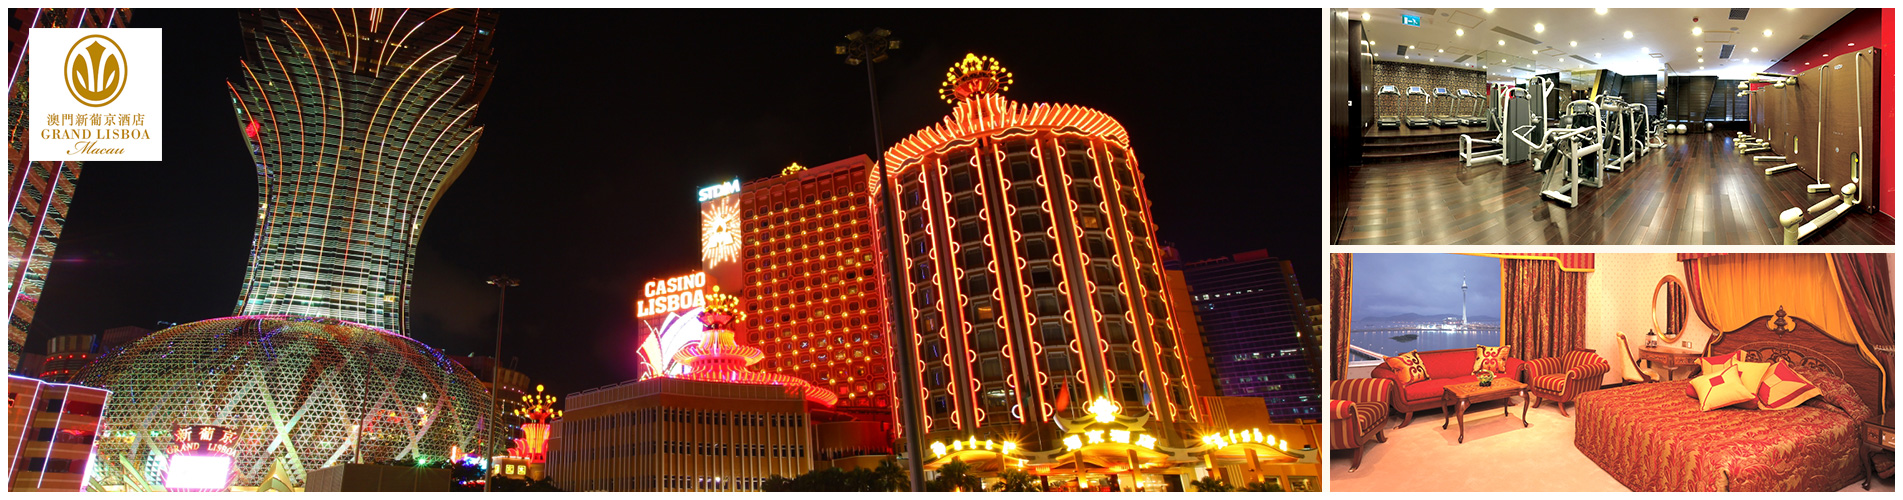 澳門新葡京酒店套票 Grand Lisboa Hotel Package